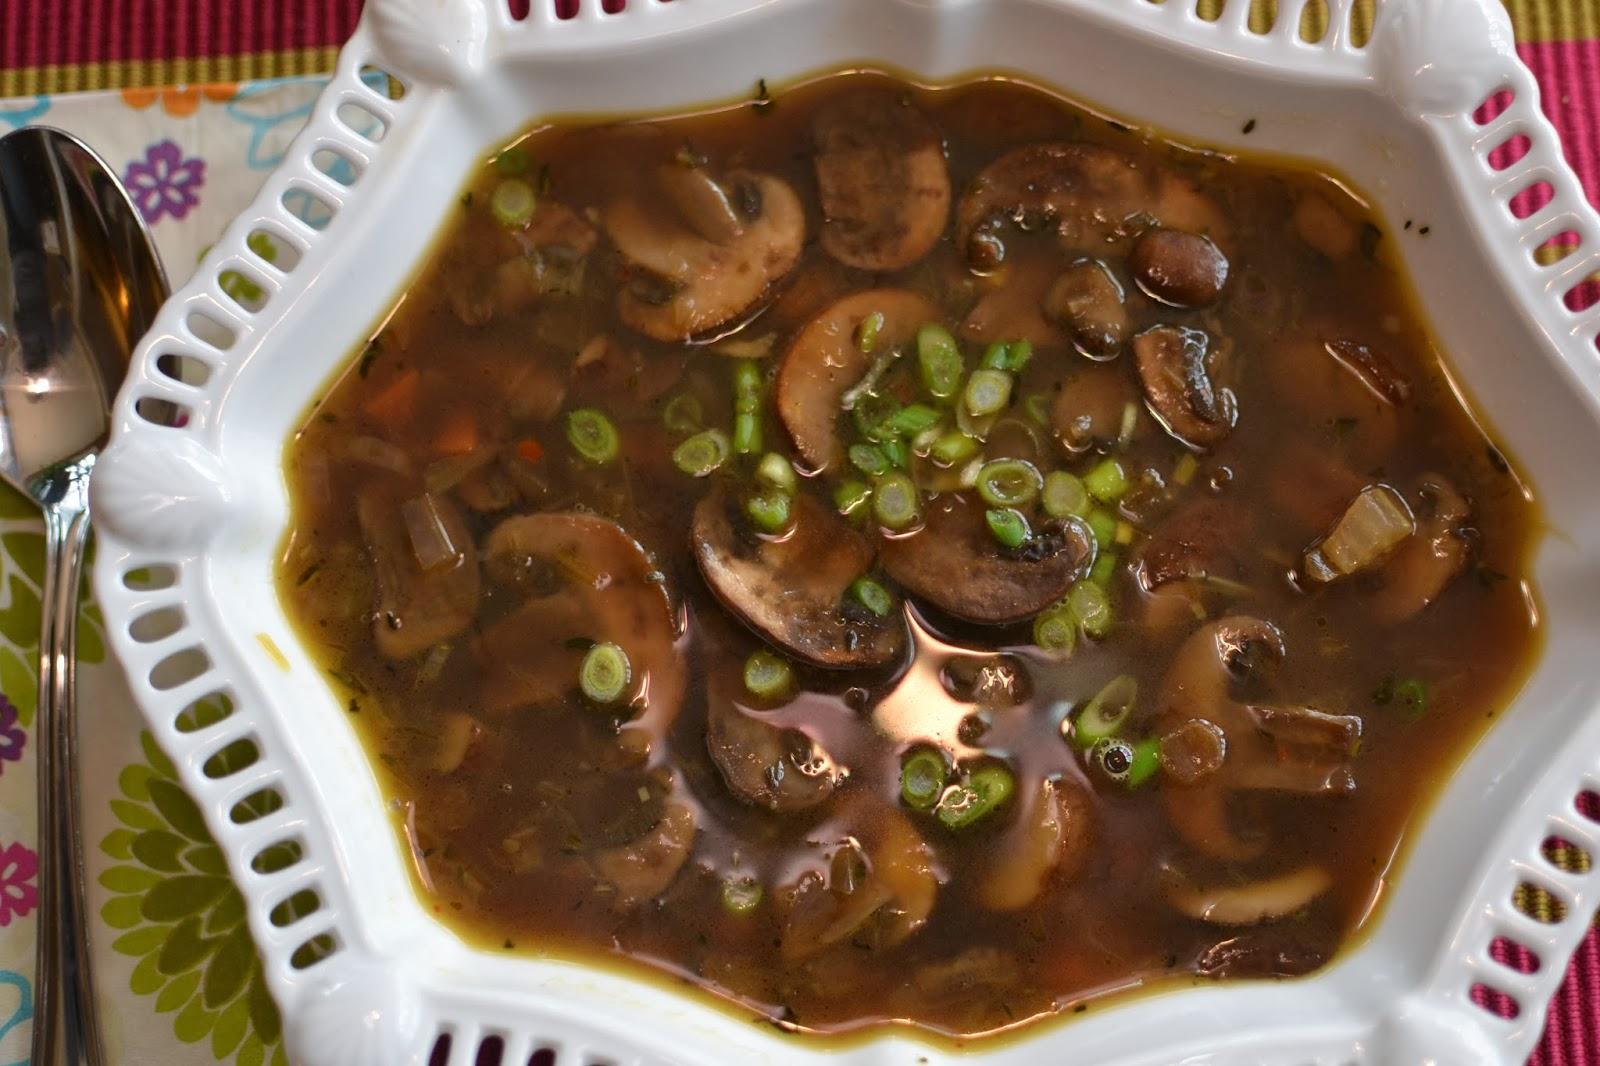 soup mushroom soup hungarian mushroom soup garlic mushroom soup ...